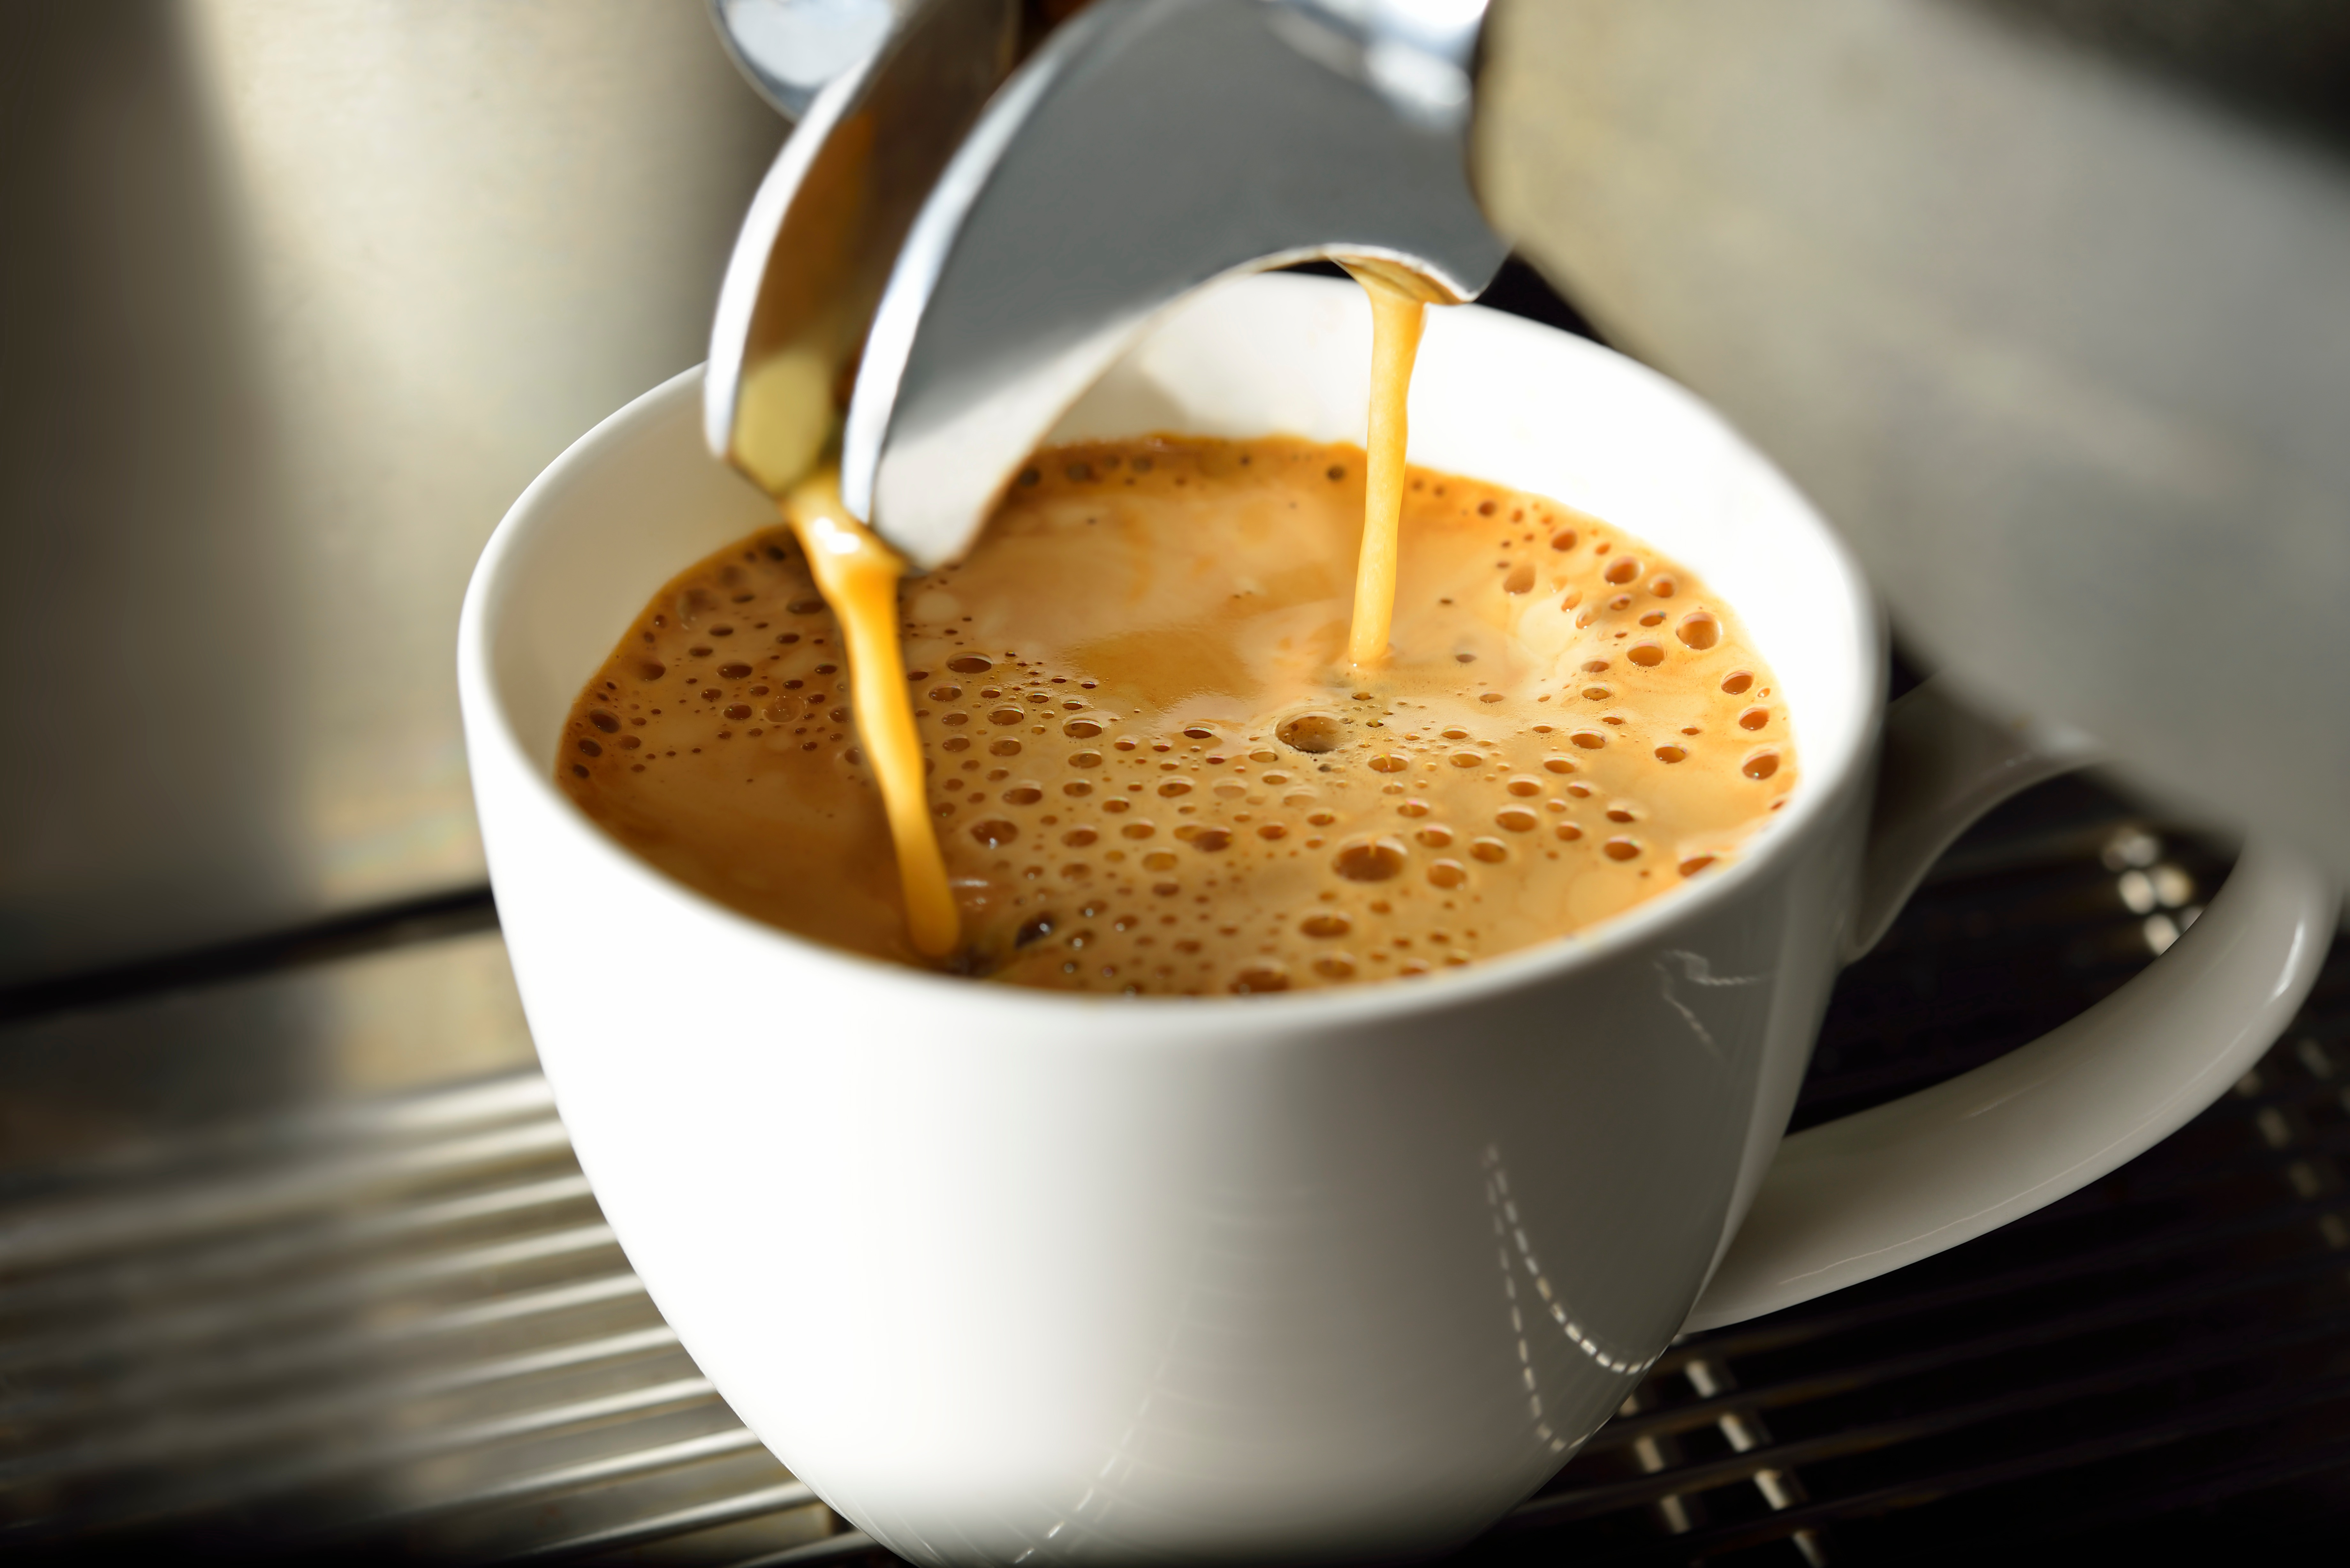 making-coffee-P3P4PDE